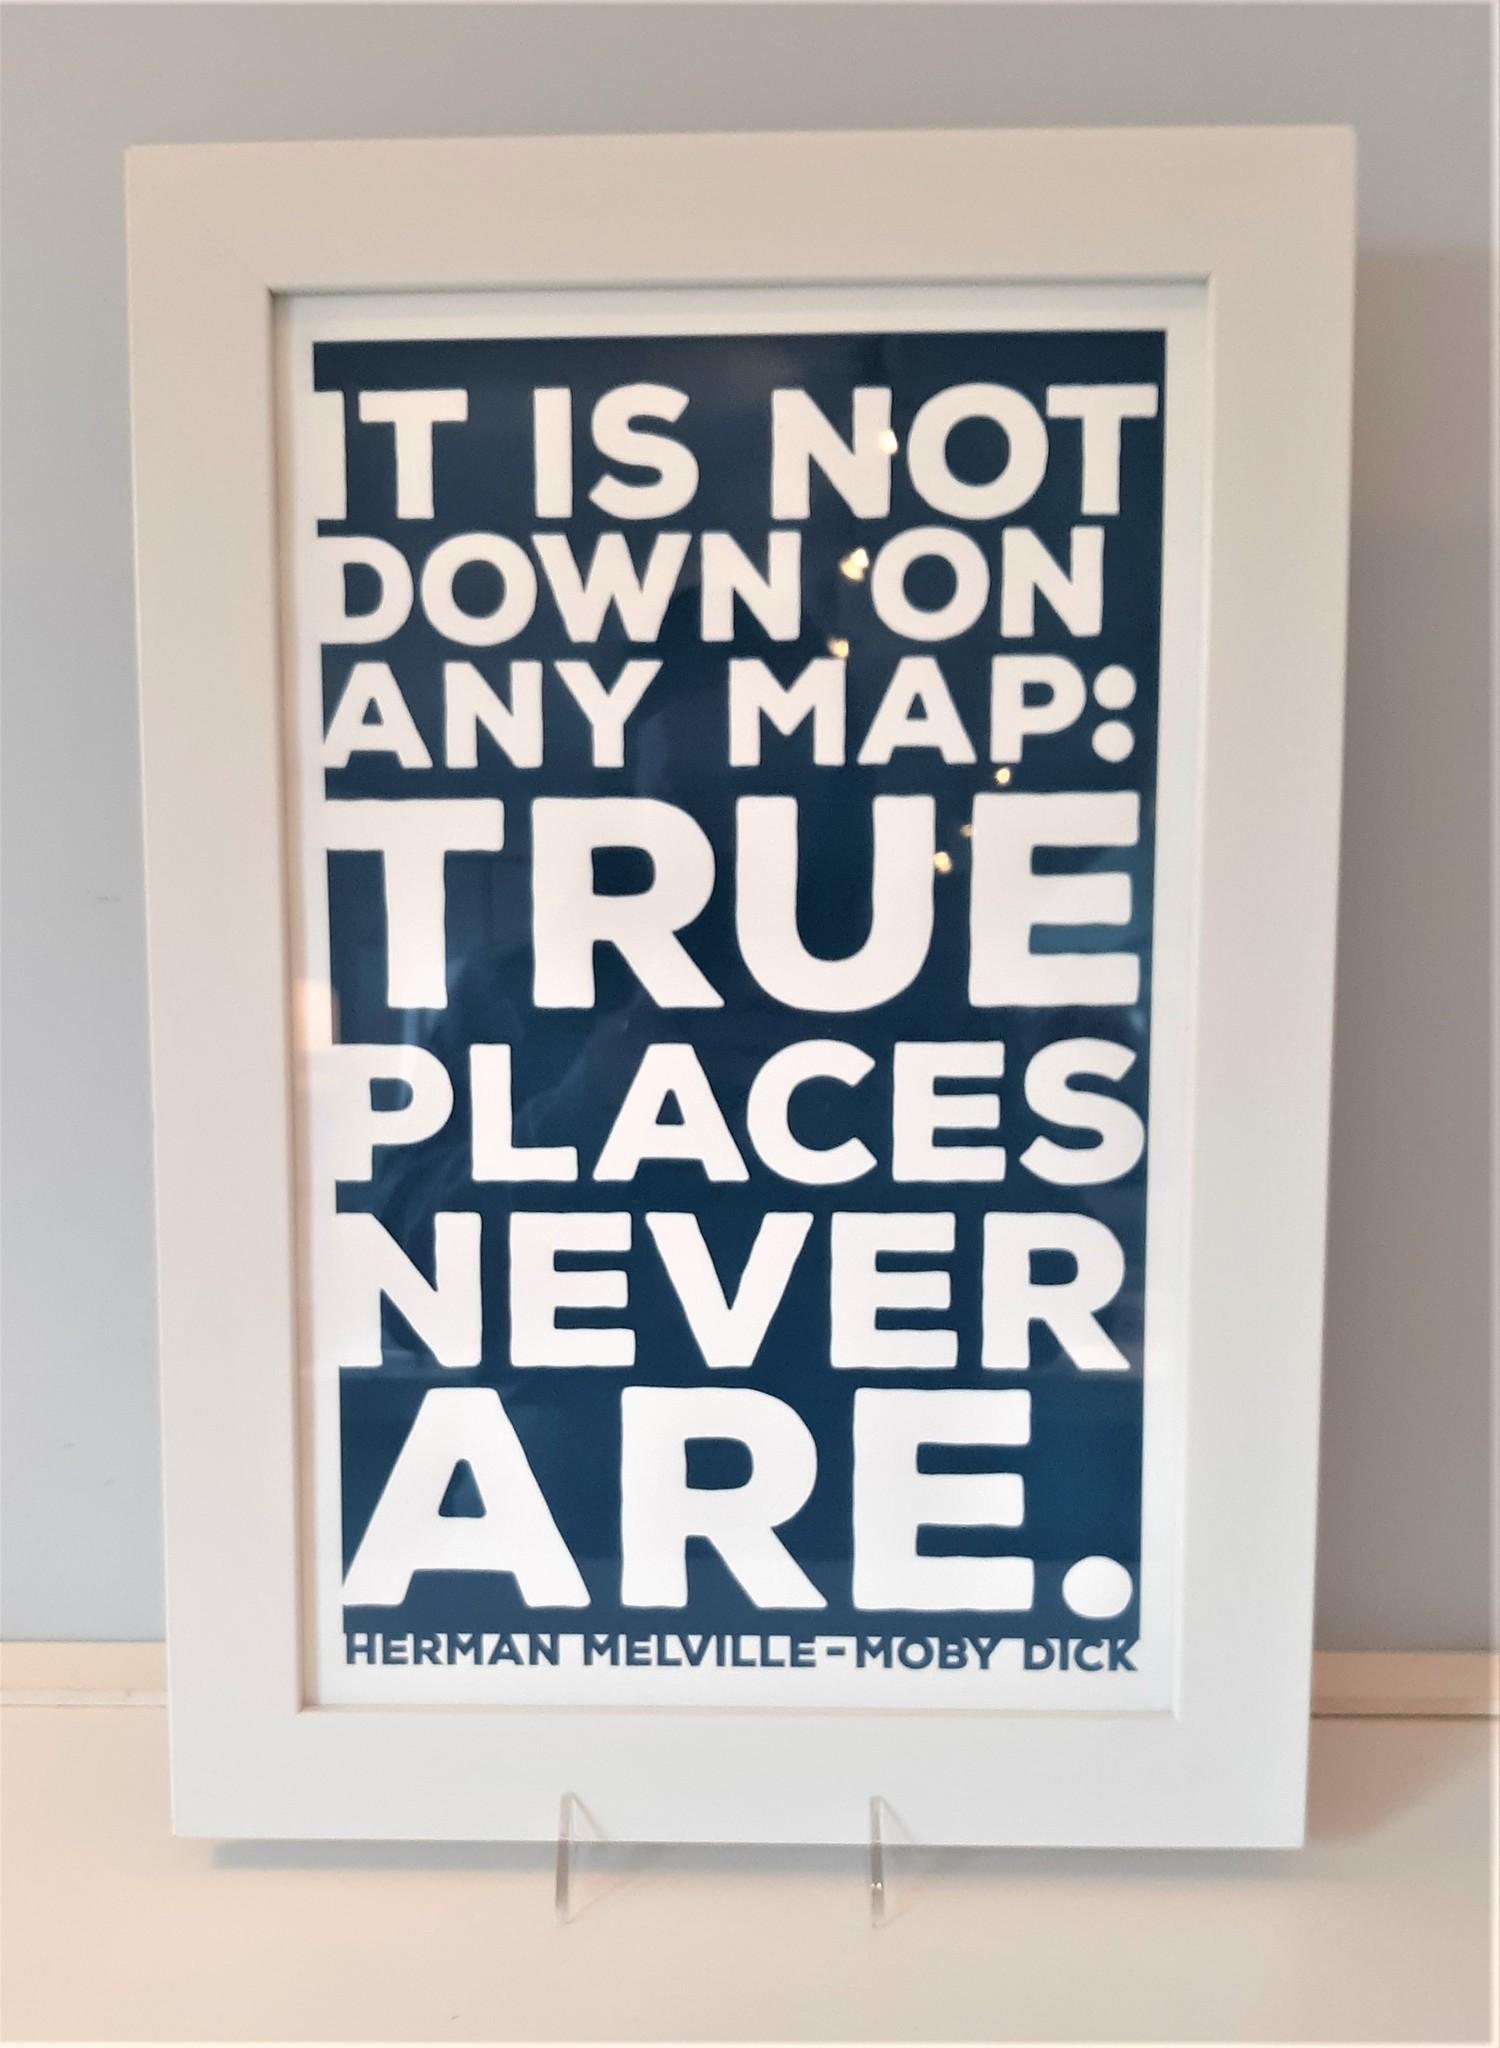 Herman Melville Quote 11x17